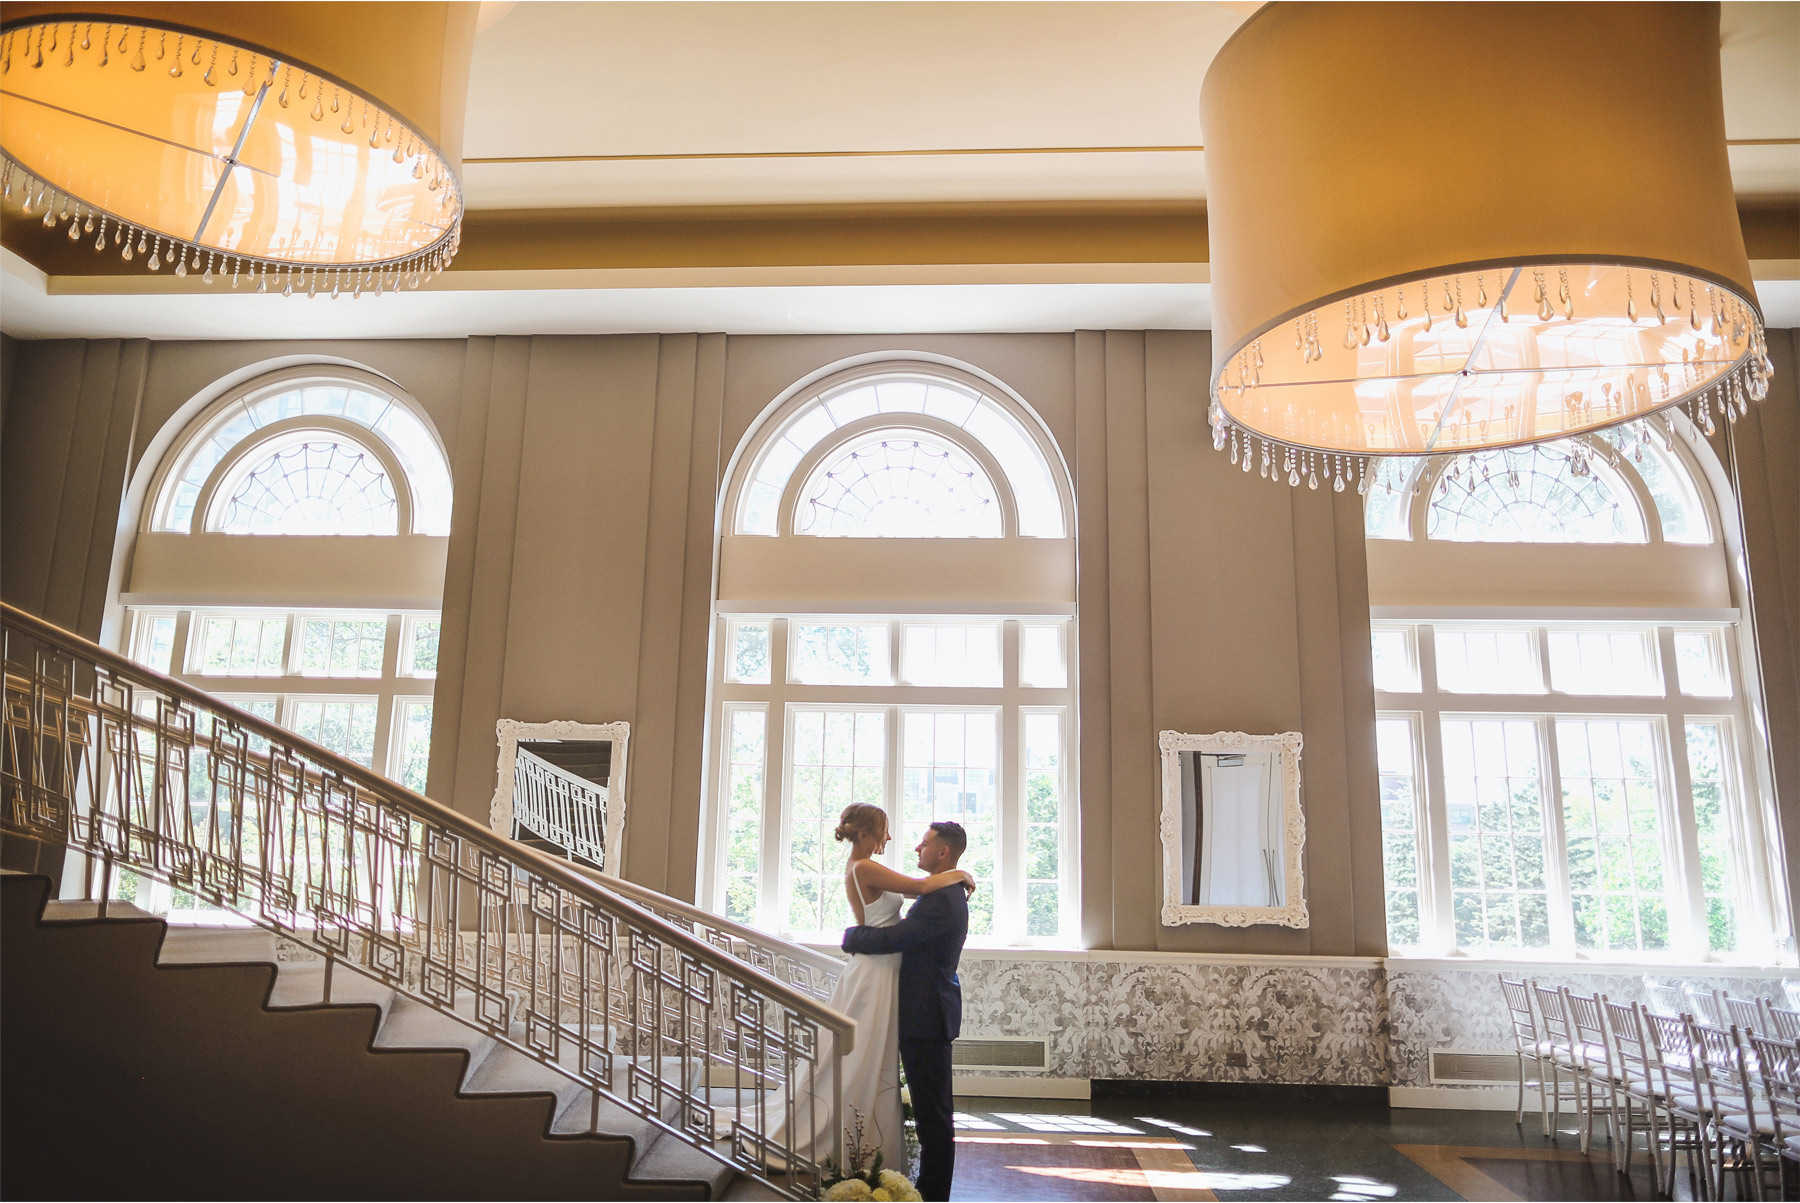 05-Minneapolis-Minnesota-Wedding-Andrew-Vick-Photography-Calhoun-Beach-Club-Bride-Groom-First-Look-Staircase-Samantha-and-Ryan.jpg